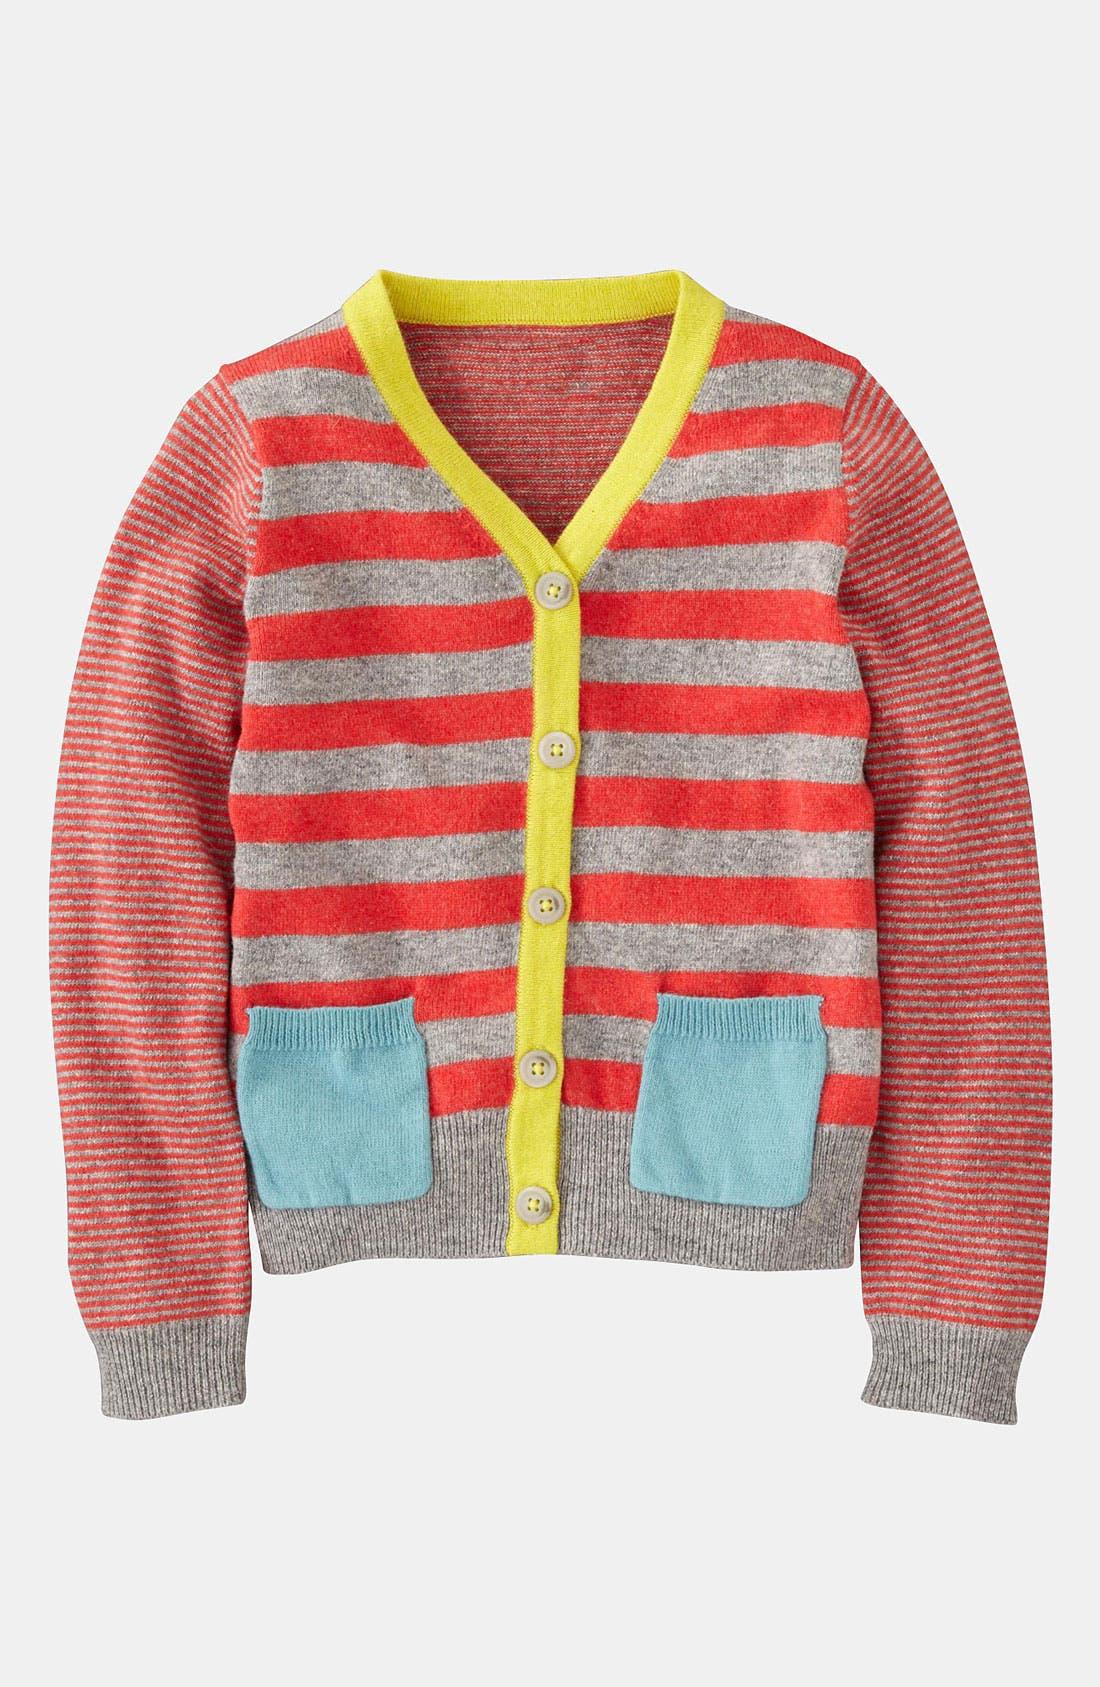 'Hotchpotch' Cardigan,                         Main,                         color, Grey Melange/ Soft Red Stripe